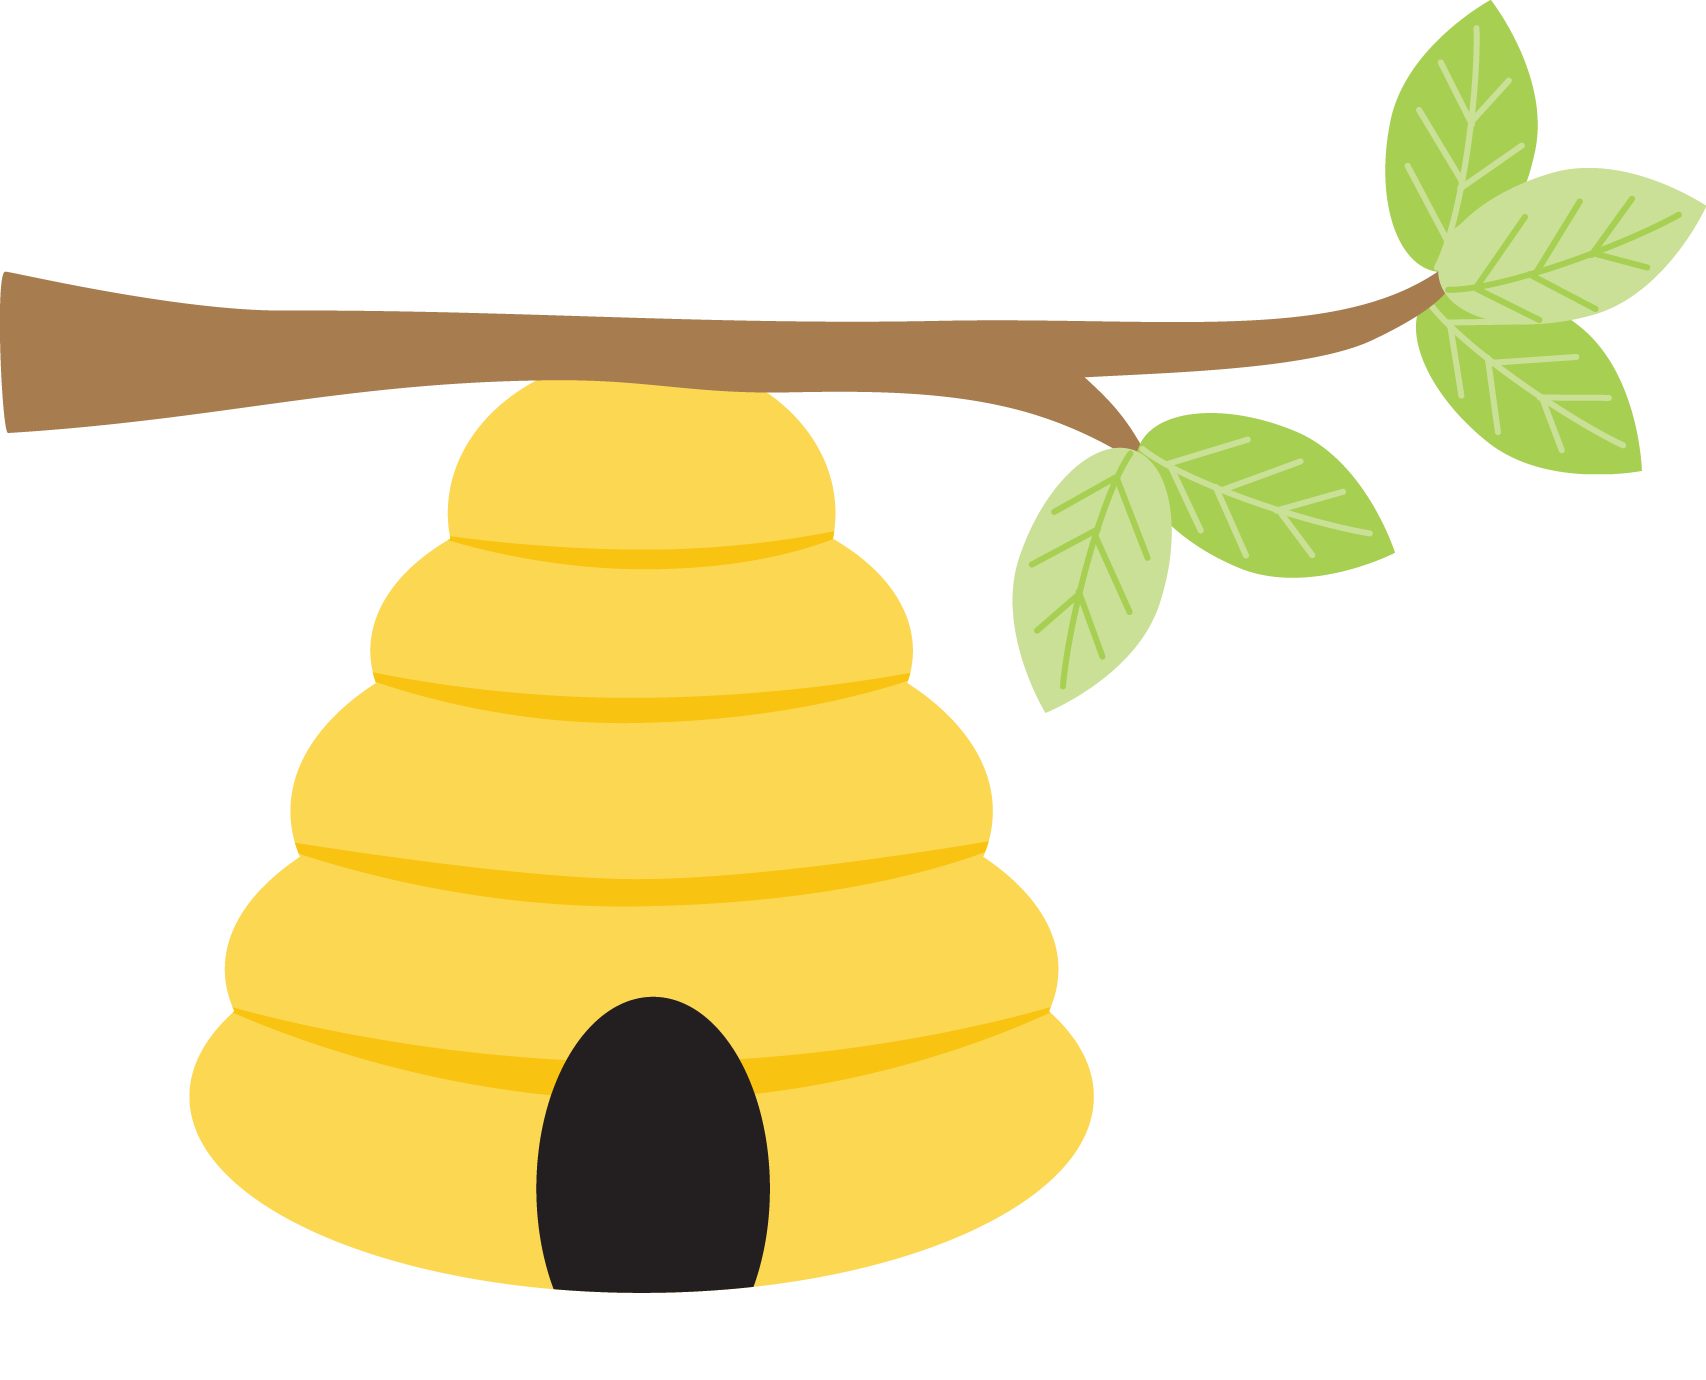 Image Royalty Free Library Bee Hive Tran #44197.